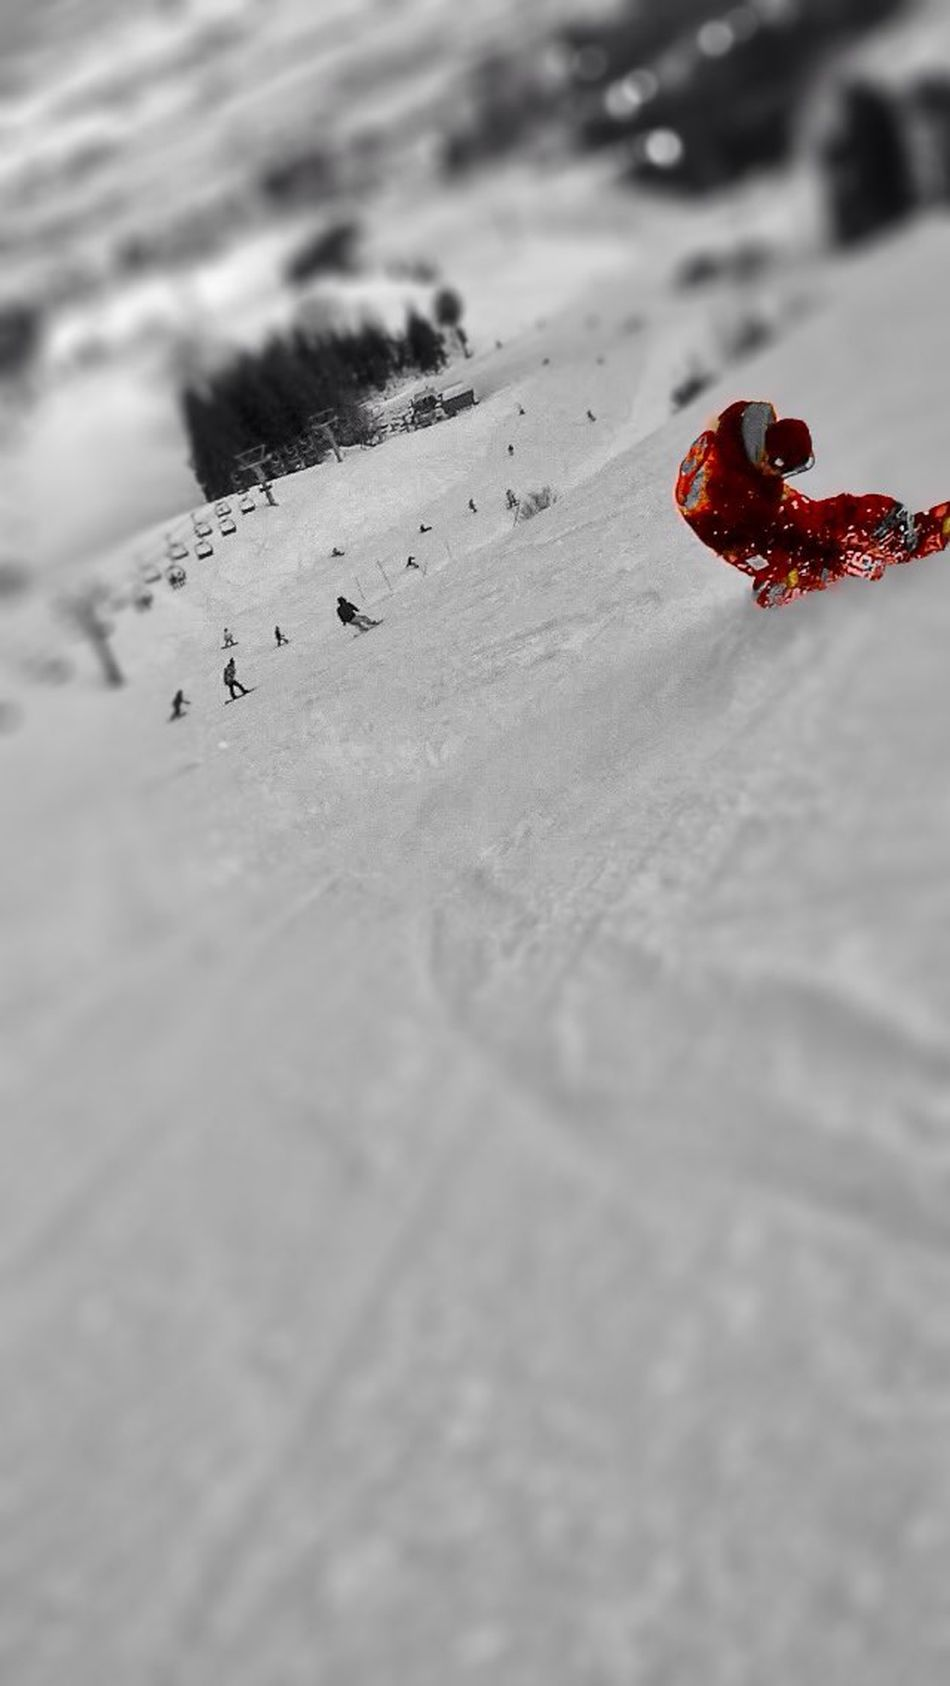 Enjoying Life Silhouette Black And White Snowboarding Rivers Turn